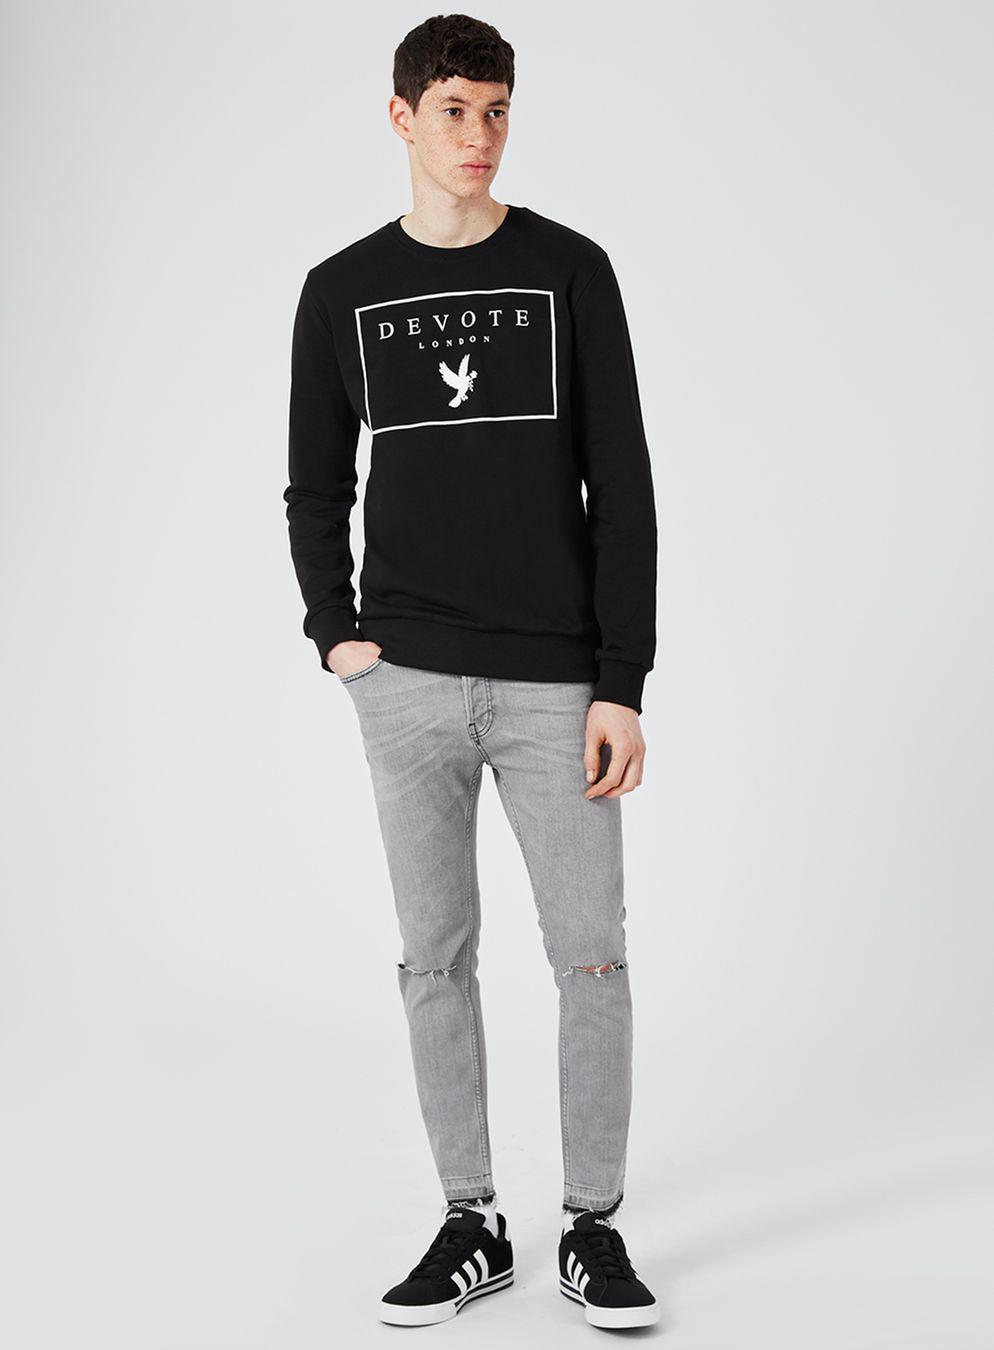 TOPMAN Cotton Devote Black Dove Panel Sweatshirt* for Men